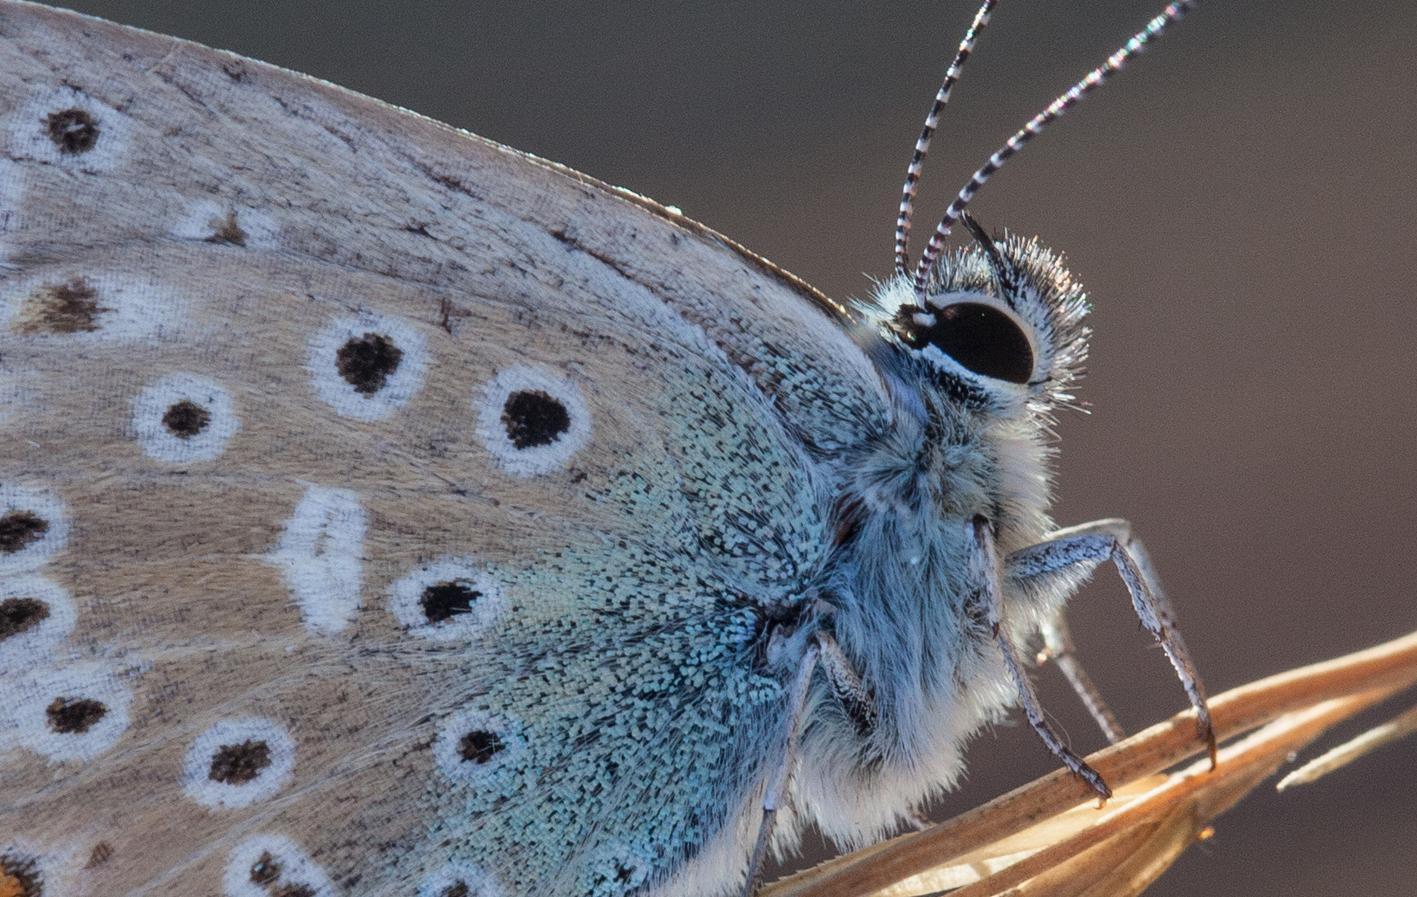 Polyommatus_icarus_1.jpg